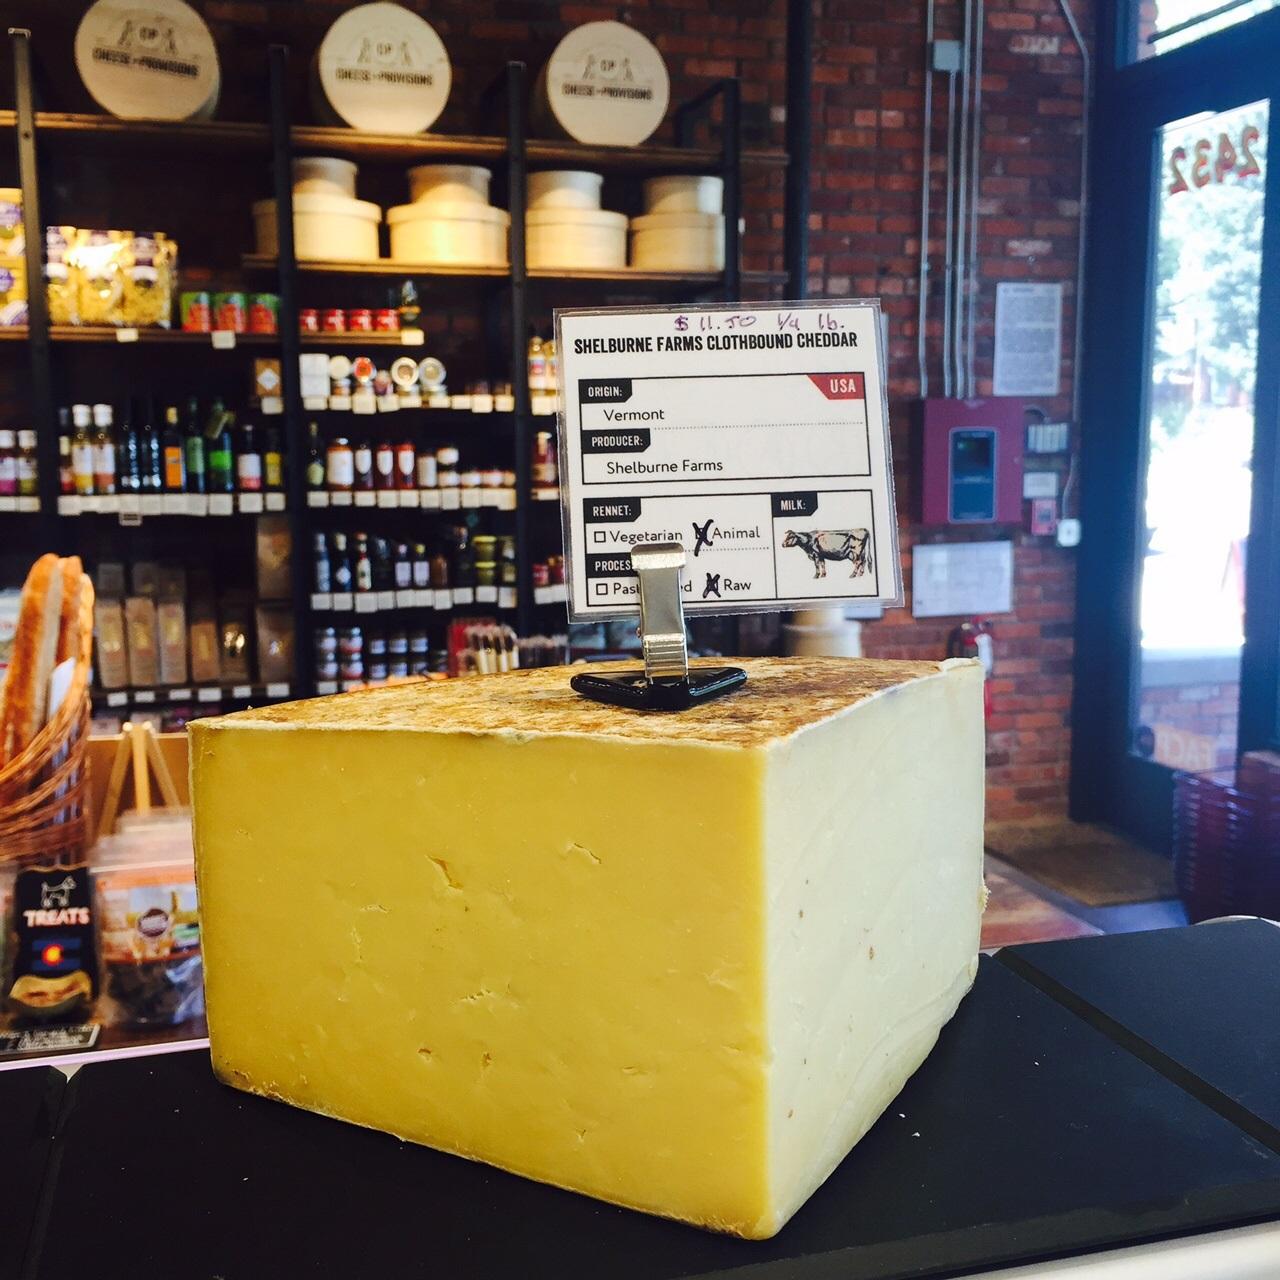 Cheese Spotlight: Shelburne Farms Clothbound Cheddar